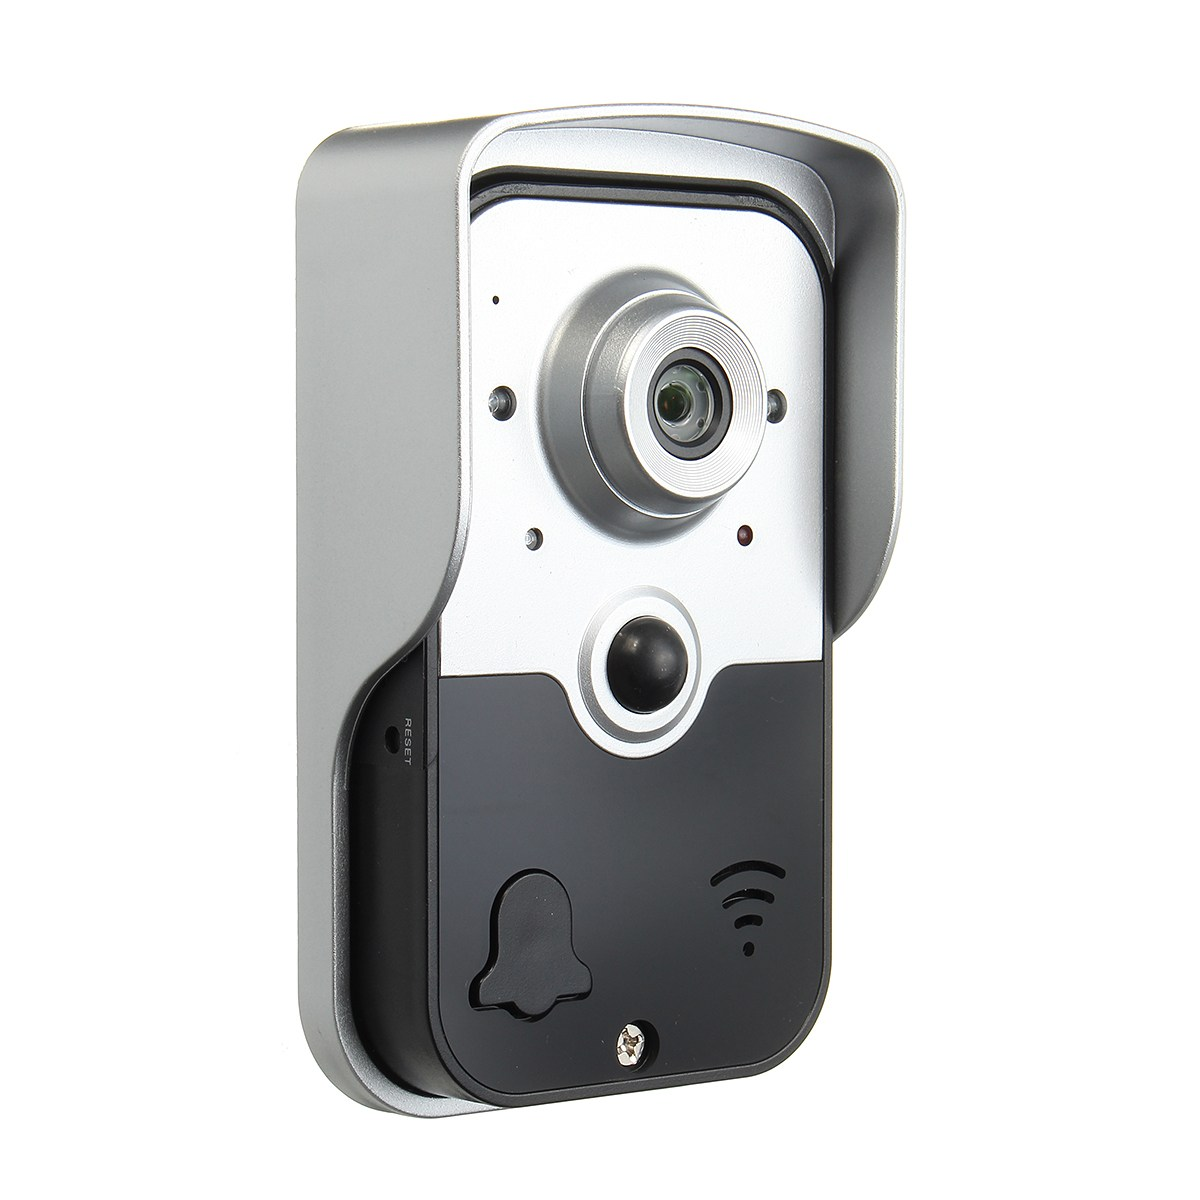 Safurance WiFi Wireless Video IR Camera Door Phone Visual Intercom Doorbell Night Version Home Security Safety bambino land игр пласт на батар вертолёт вох 33х15х14см арт 2013а б40157